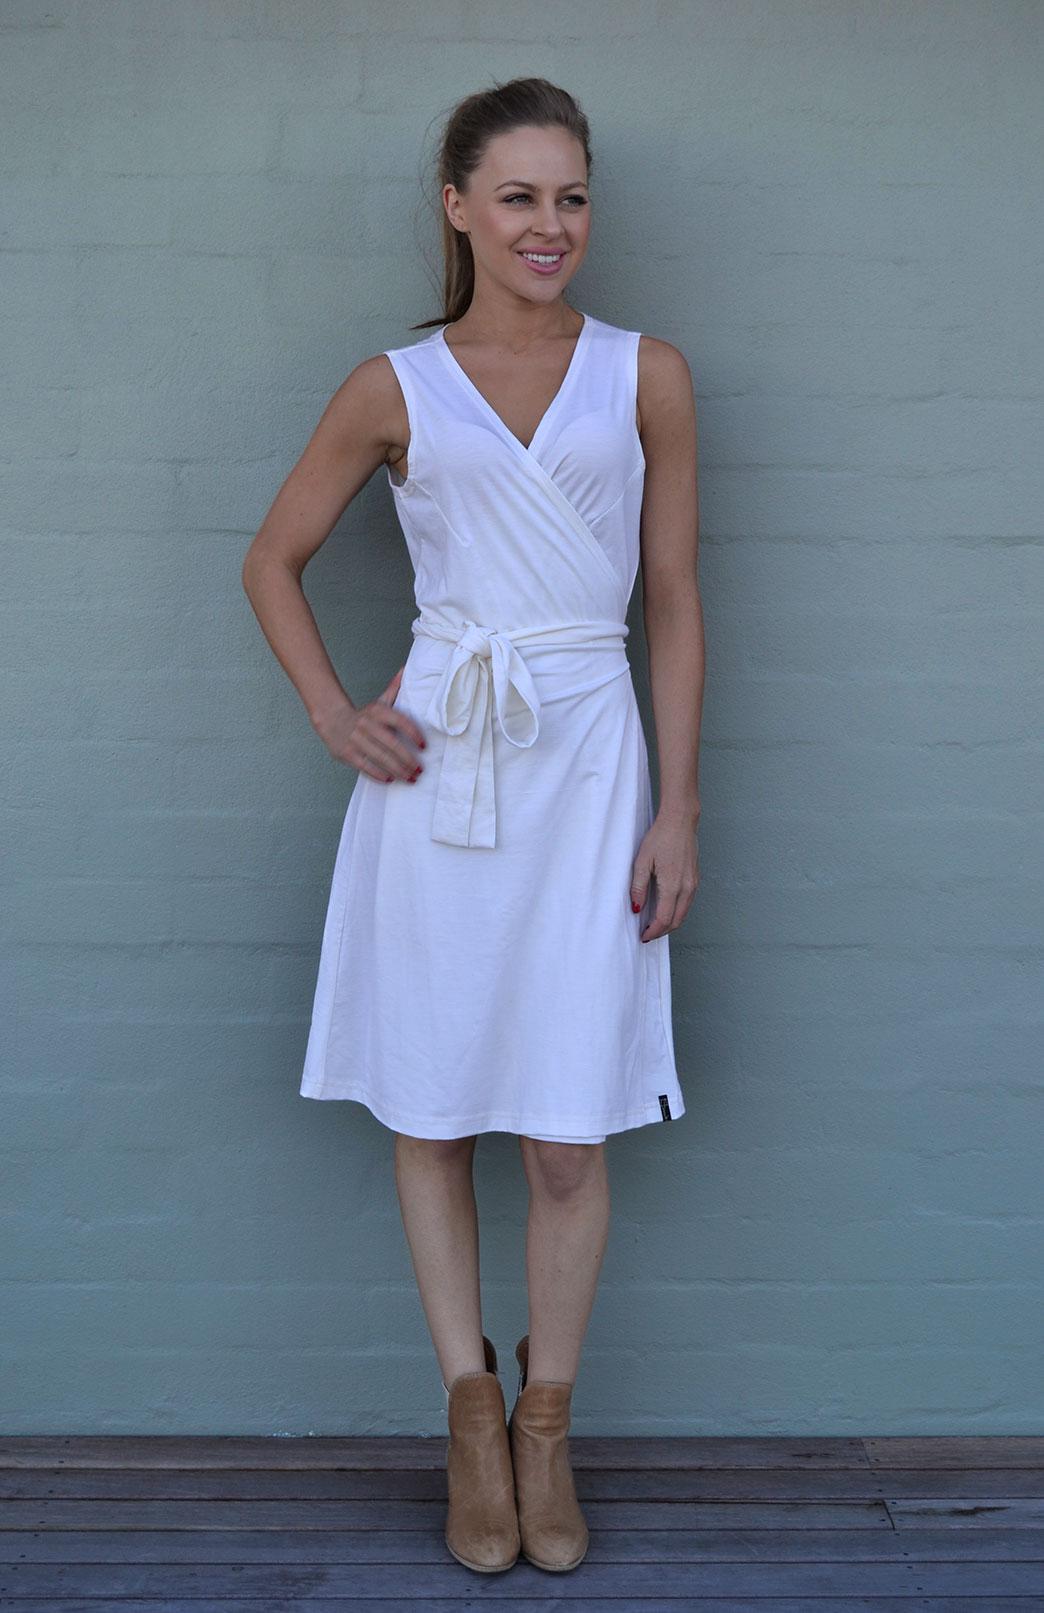 17a9a3cc6213 Maternity Dresses | Smitten Merino Tasmania Australia